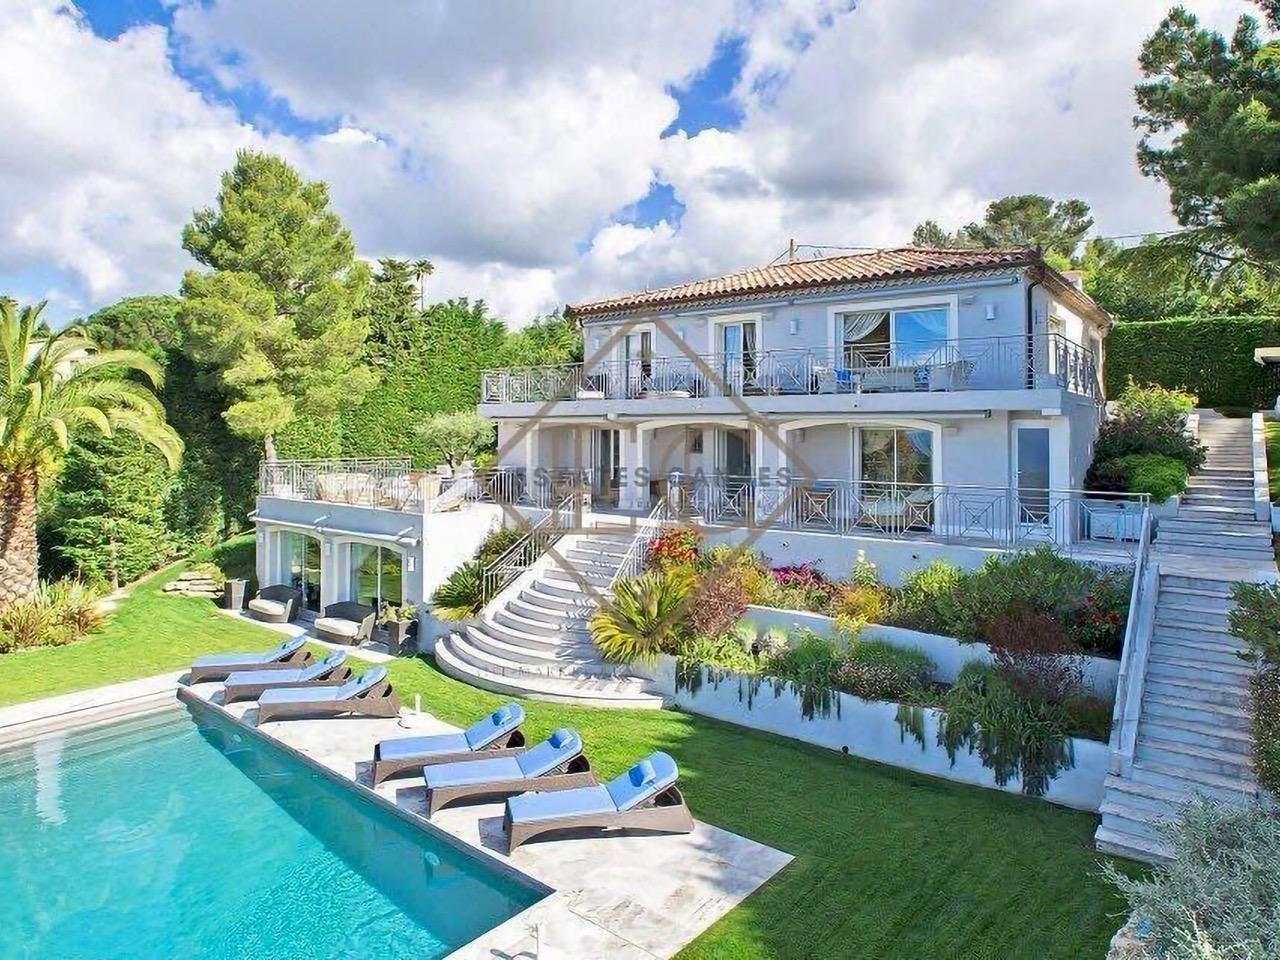 Luxury-Neo-Provencal-Villa-in-Cannes-0